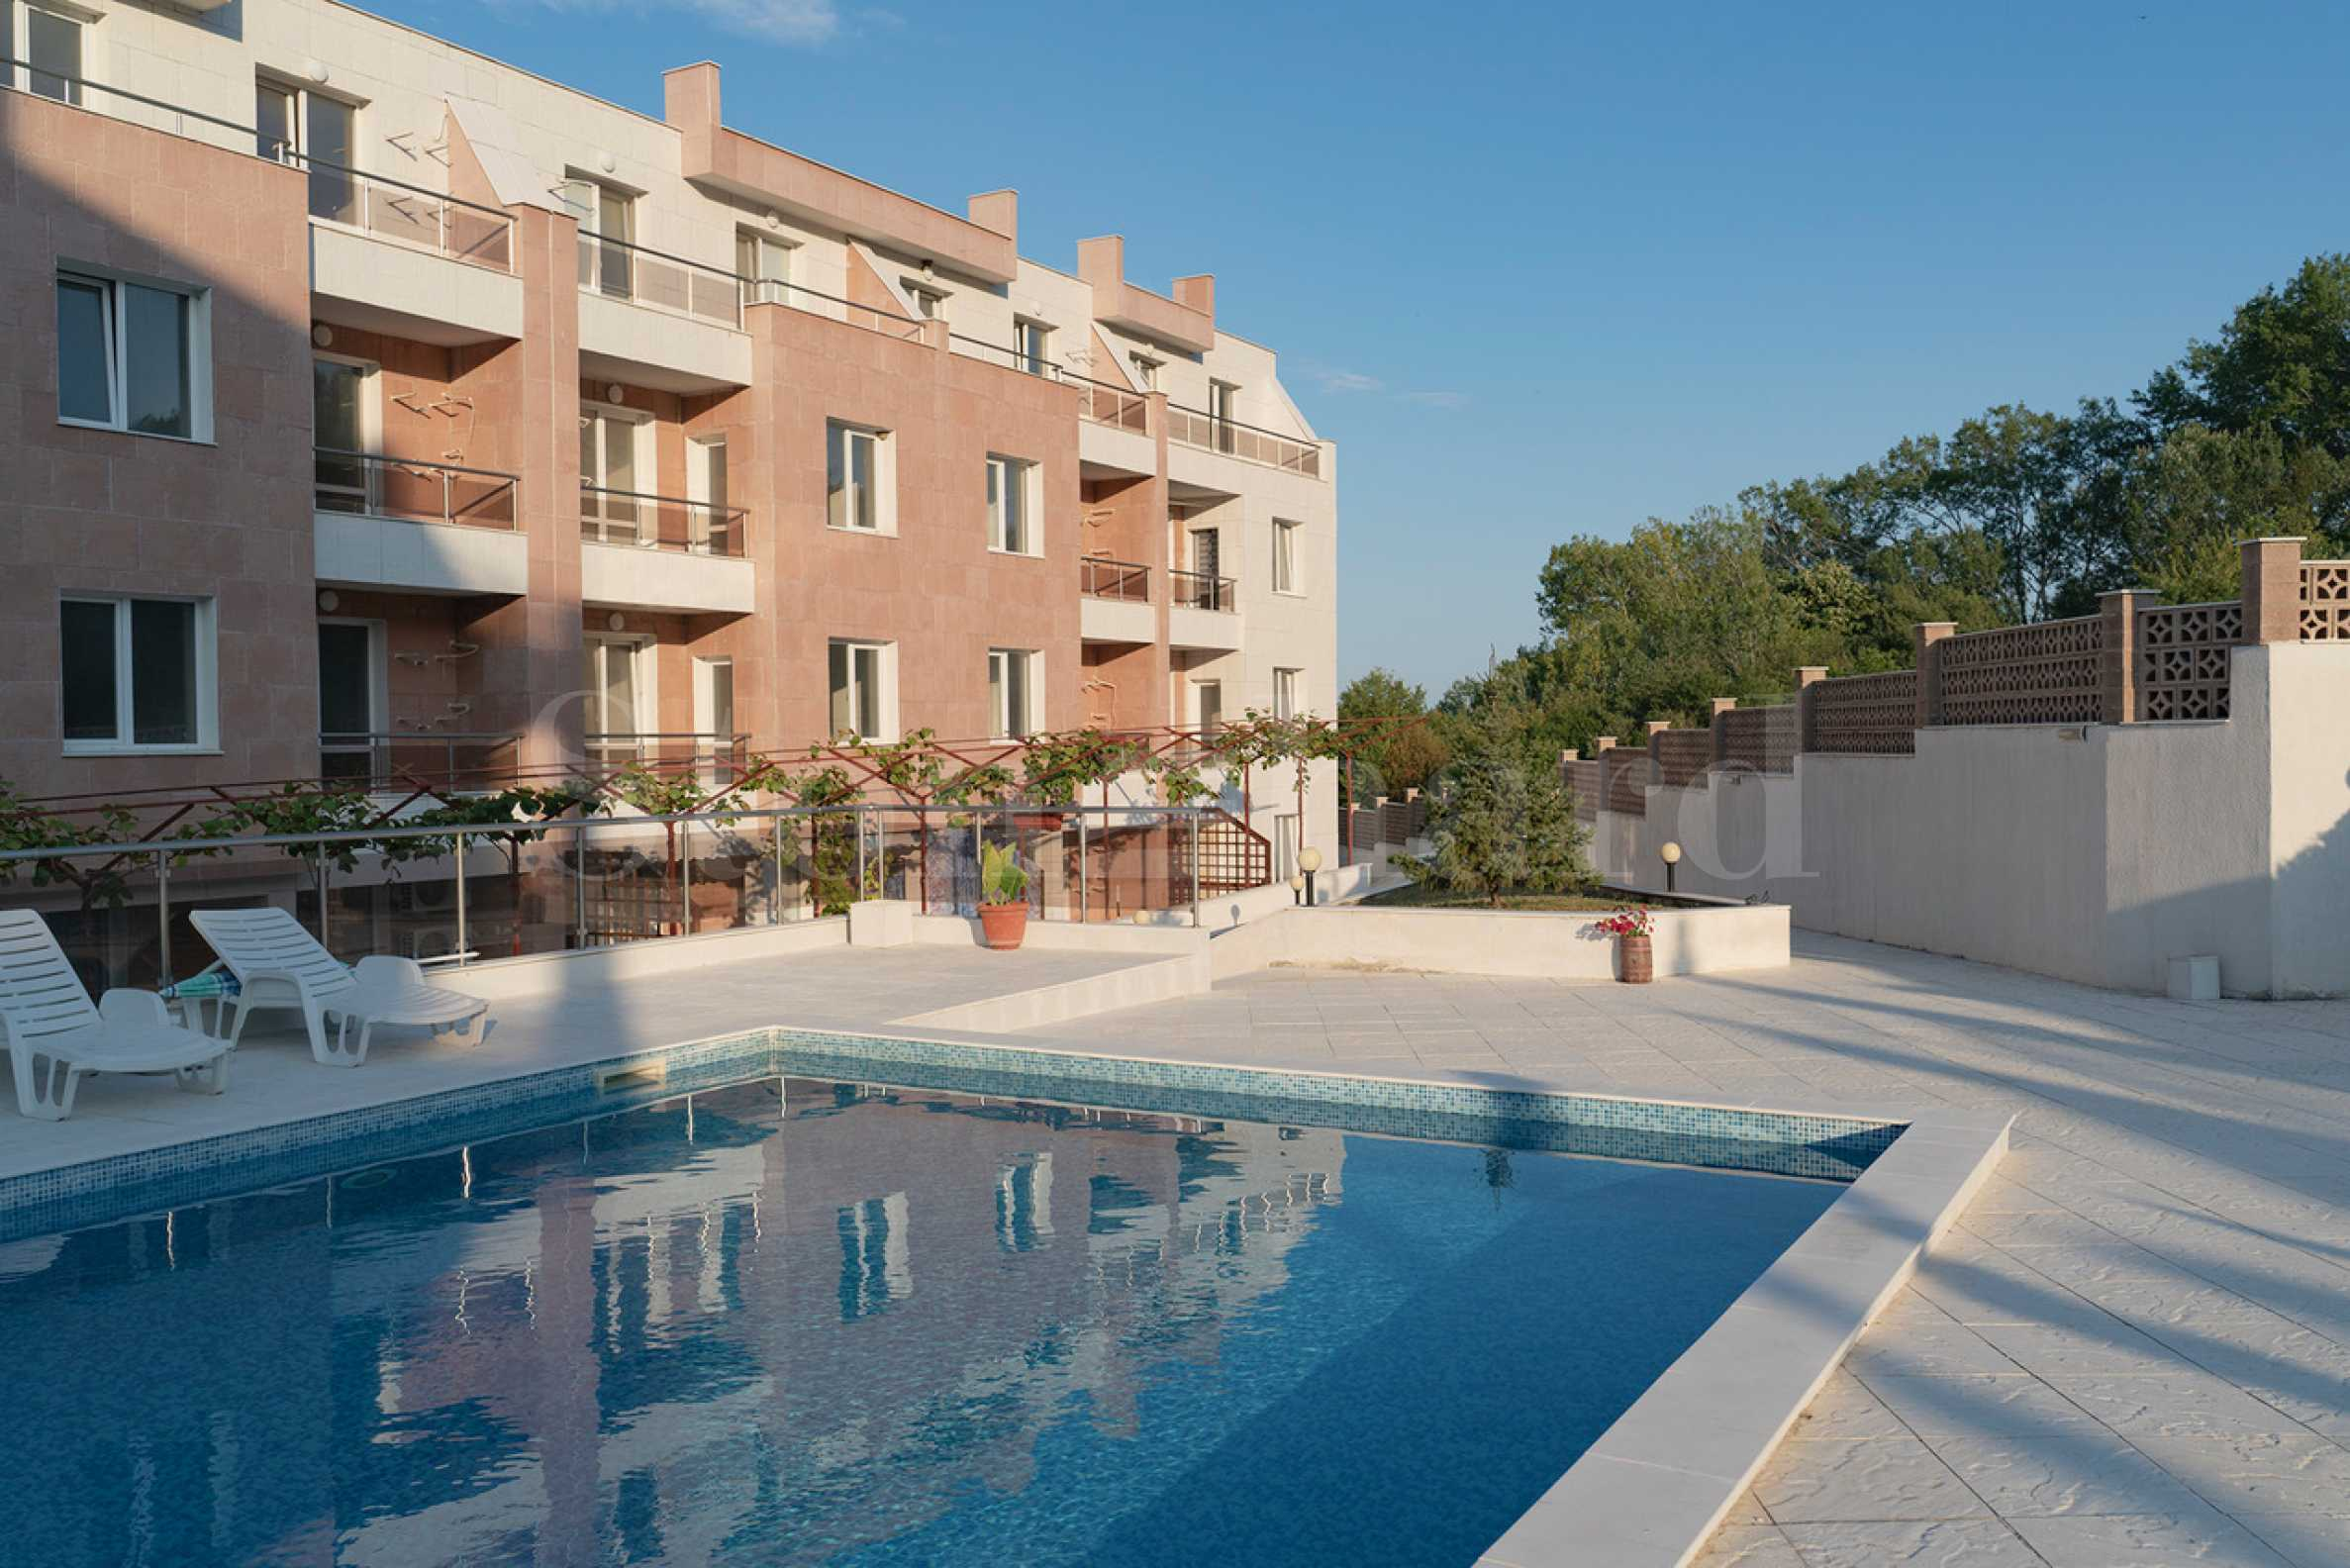 Apartment in Byala (Varna)1 - Stonehard